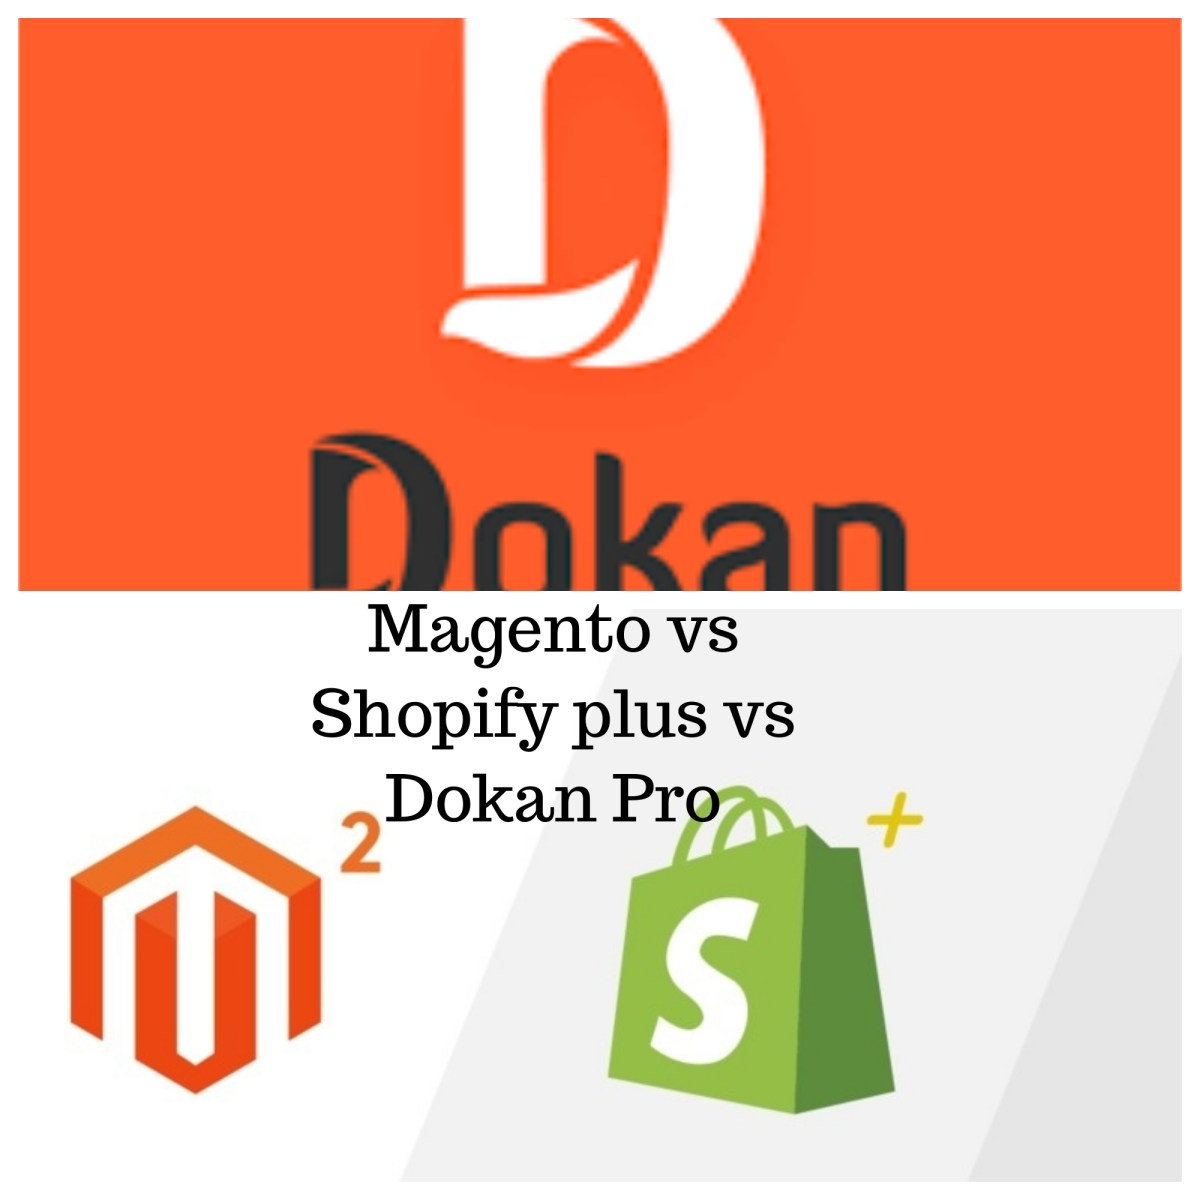 Magento vs Shopify Plus vs Dokan Pro: The Enterprise eCommerce